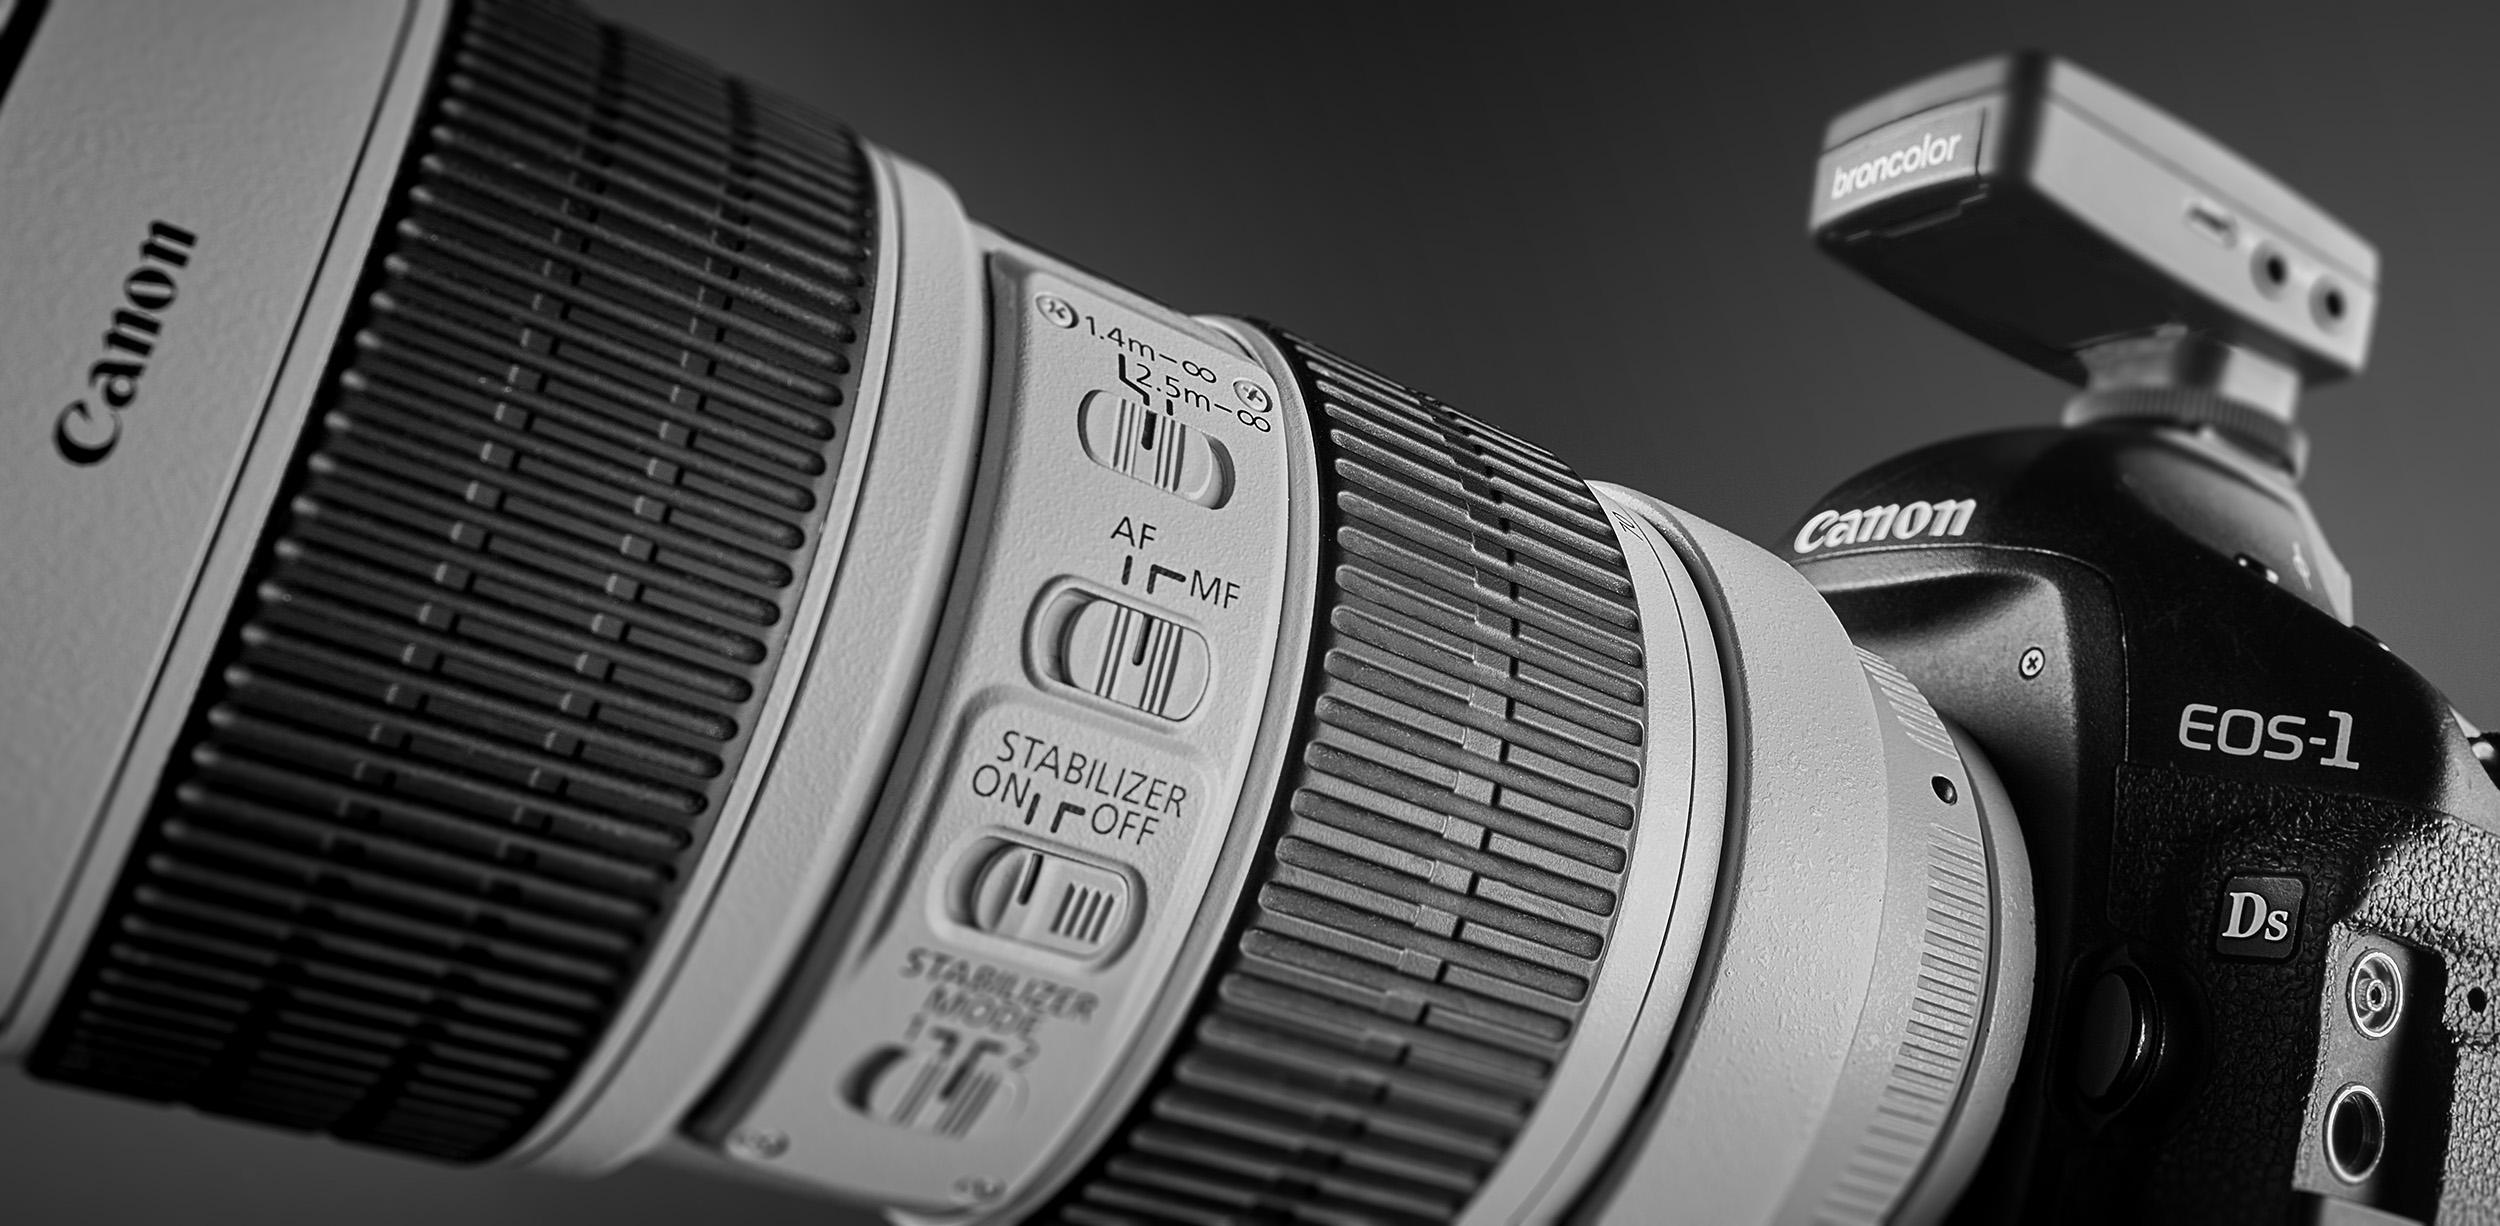 Fotografen België Limburg Paul Delaet Fotografisch atelier commercieel advertising fotografie